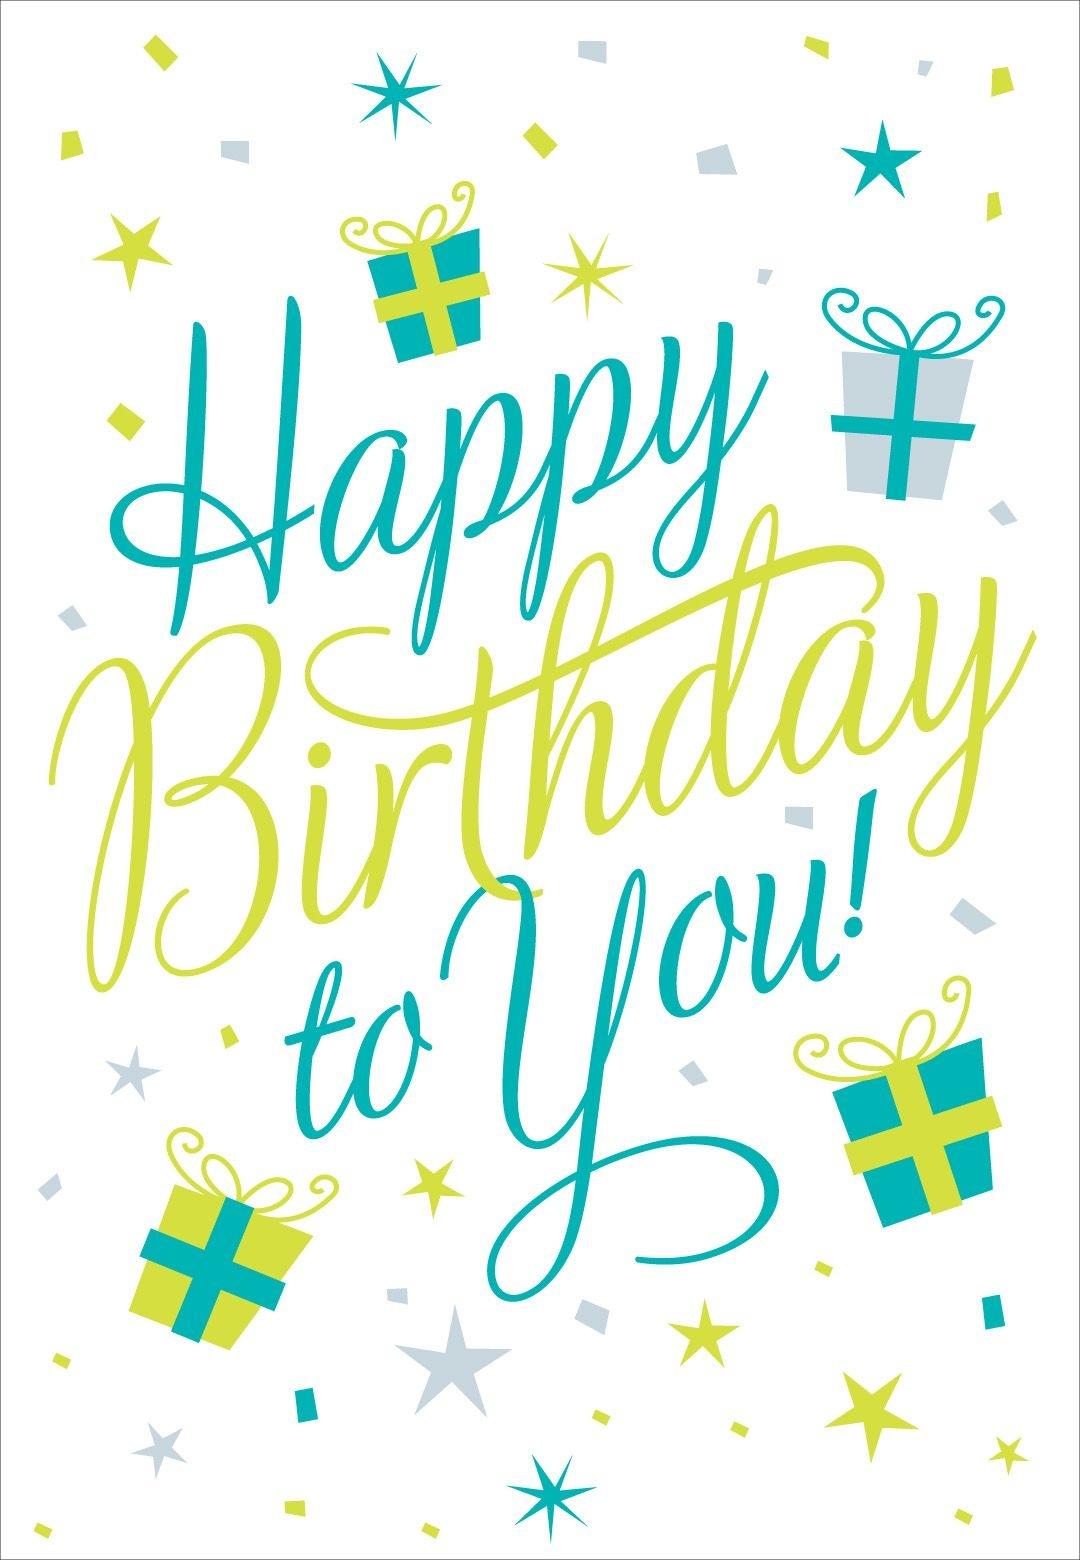 Free Printable Happy Birthday To You Greeting Card #birthday - Happy Birthday Free Cards Printable